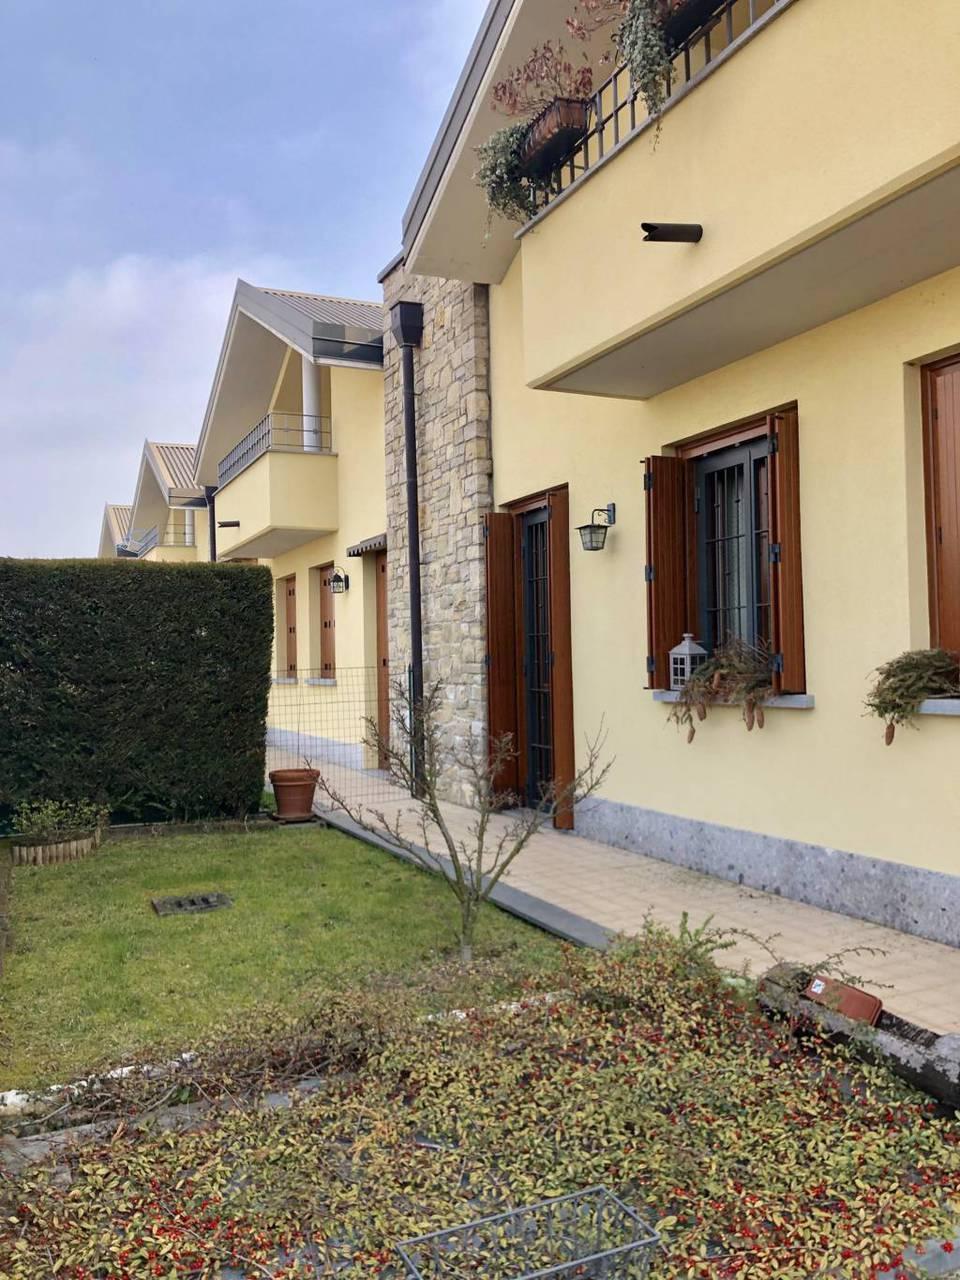 Villa-di-testa-Sulbiate-in-vendita-19